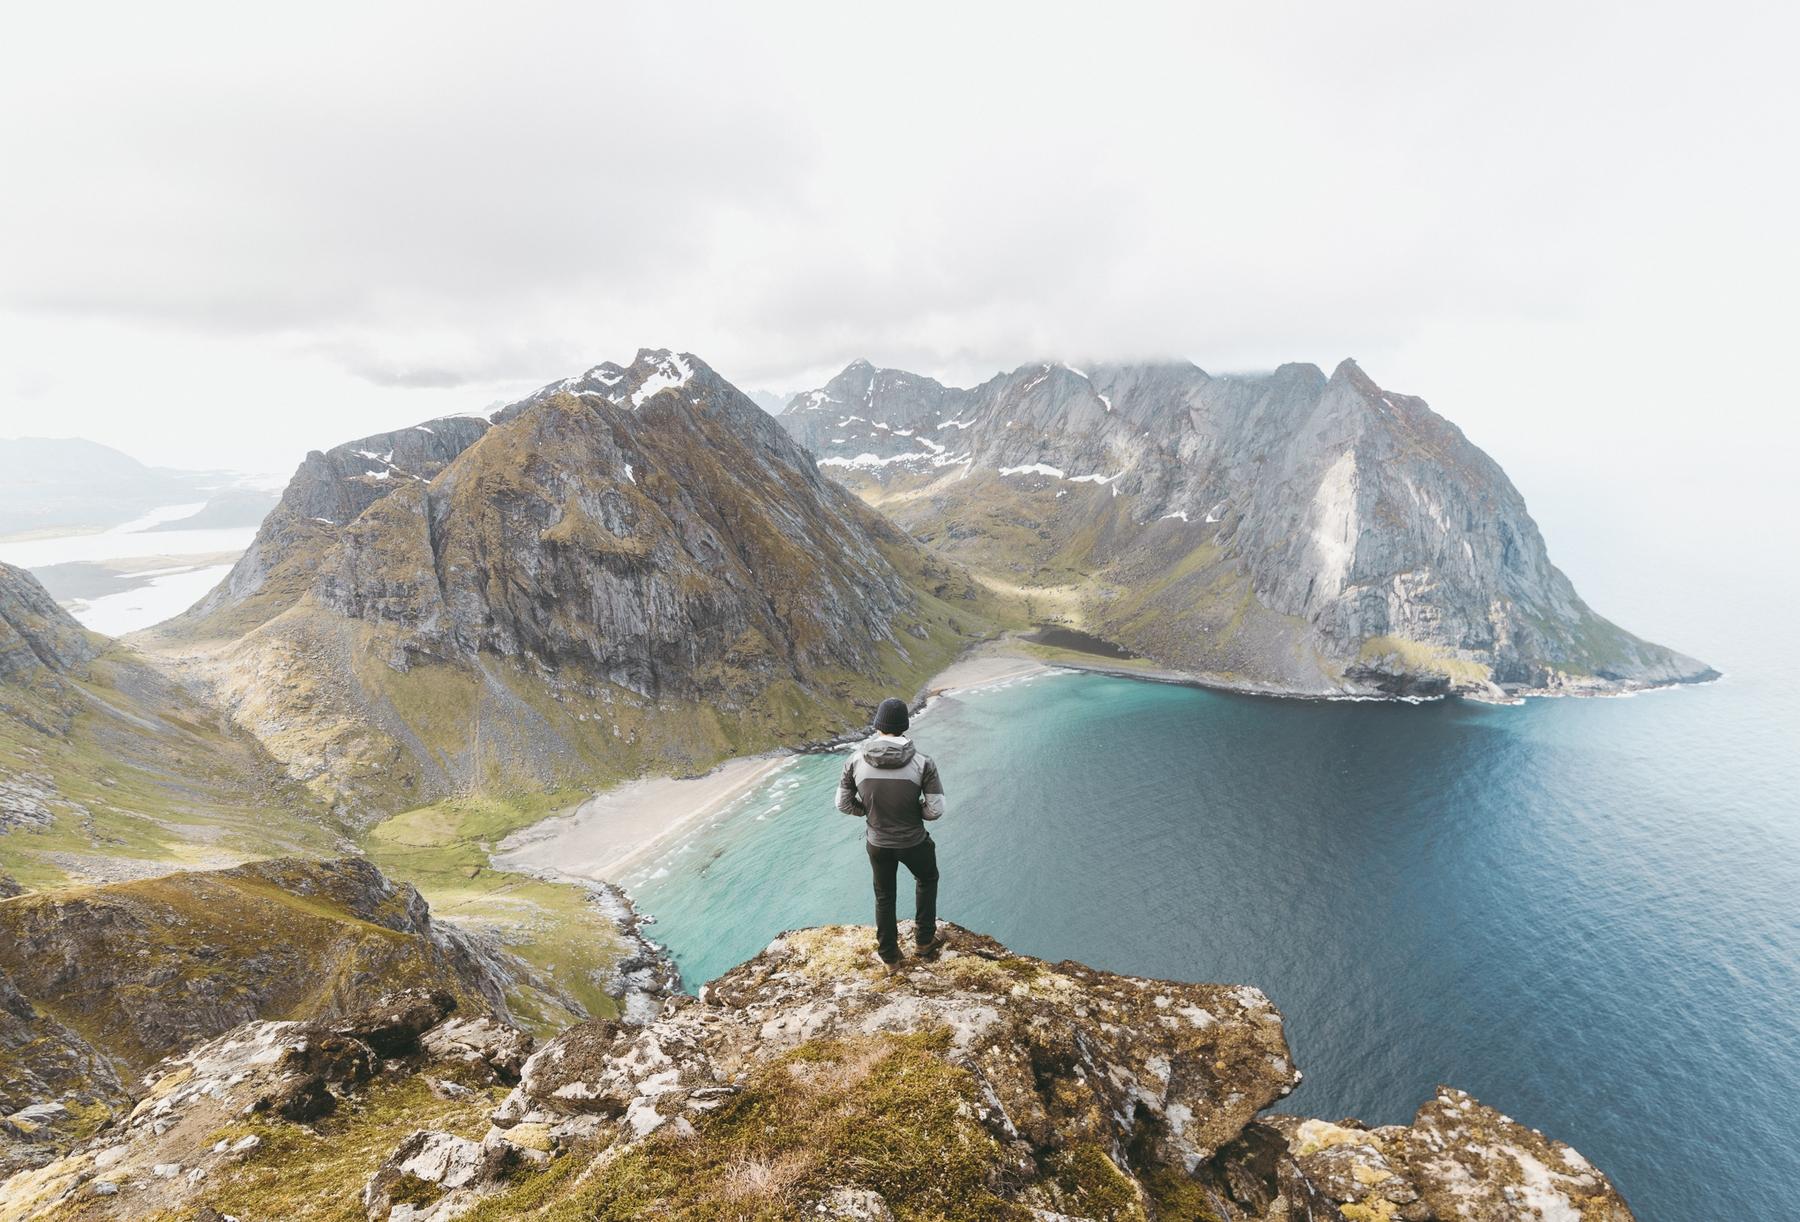 man standing on mountain top overlooking bay